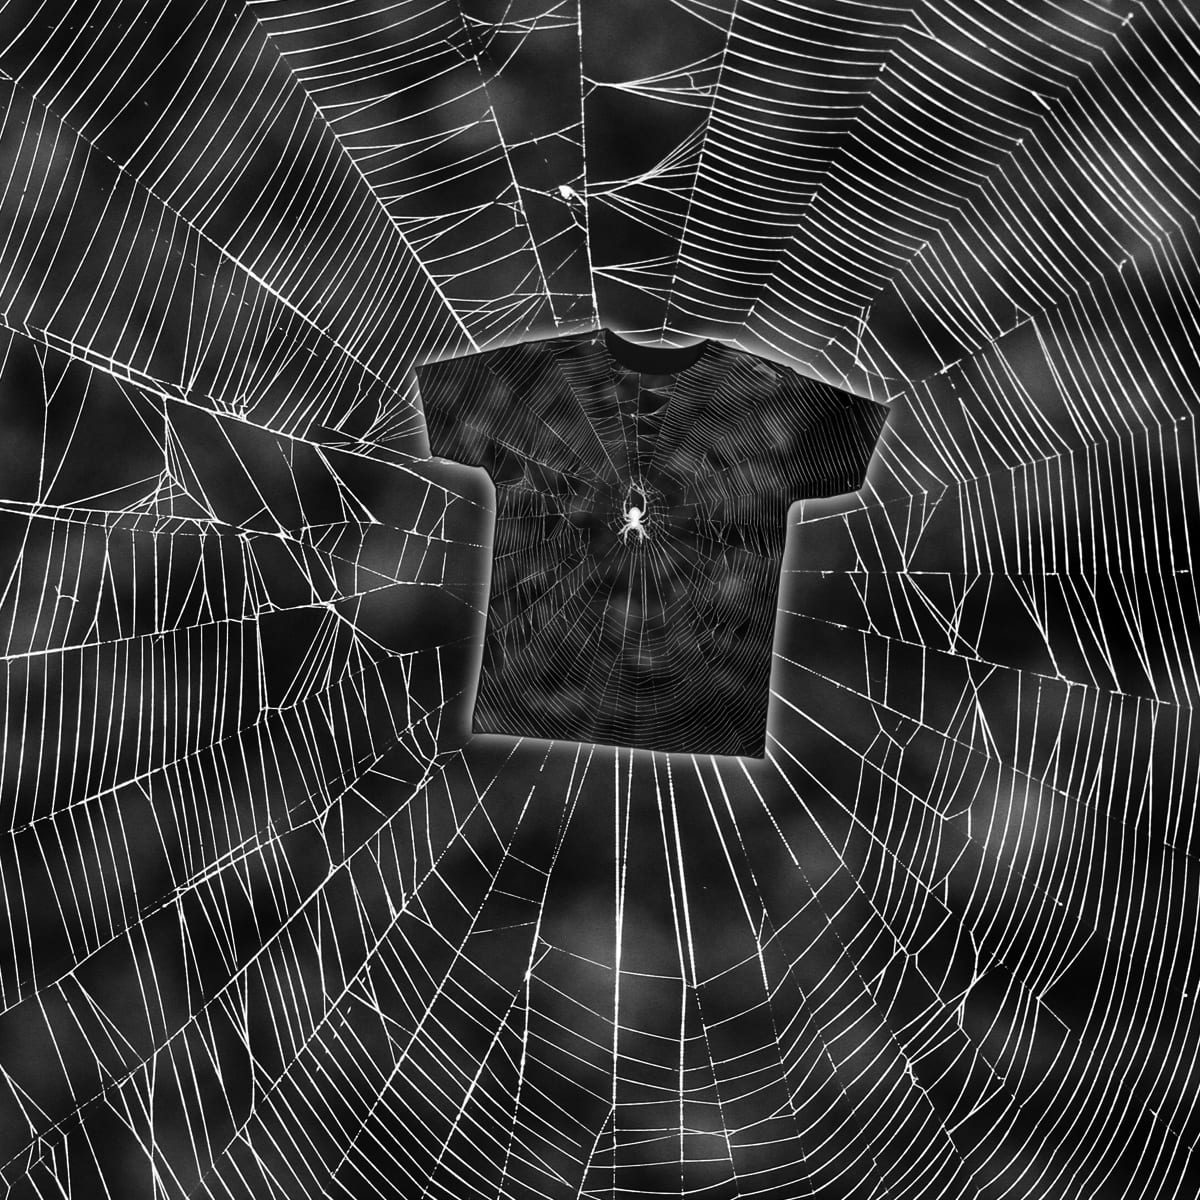 Spider, man! by cshimala on Threadless